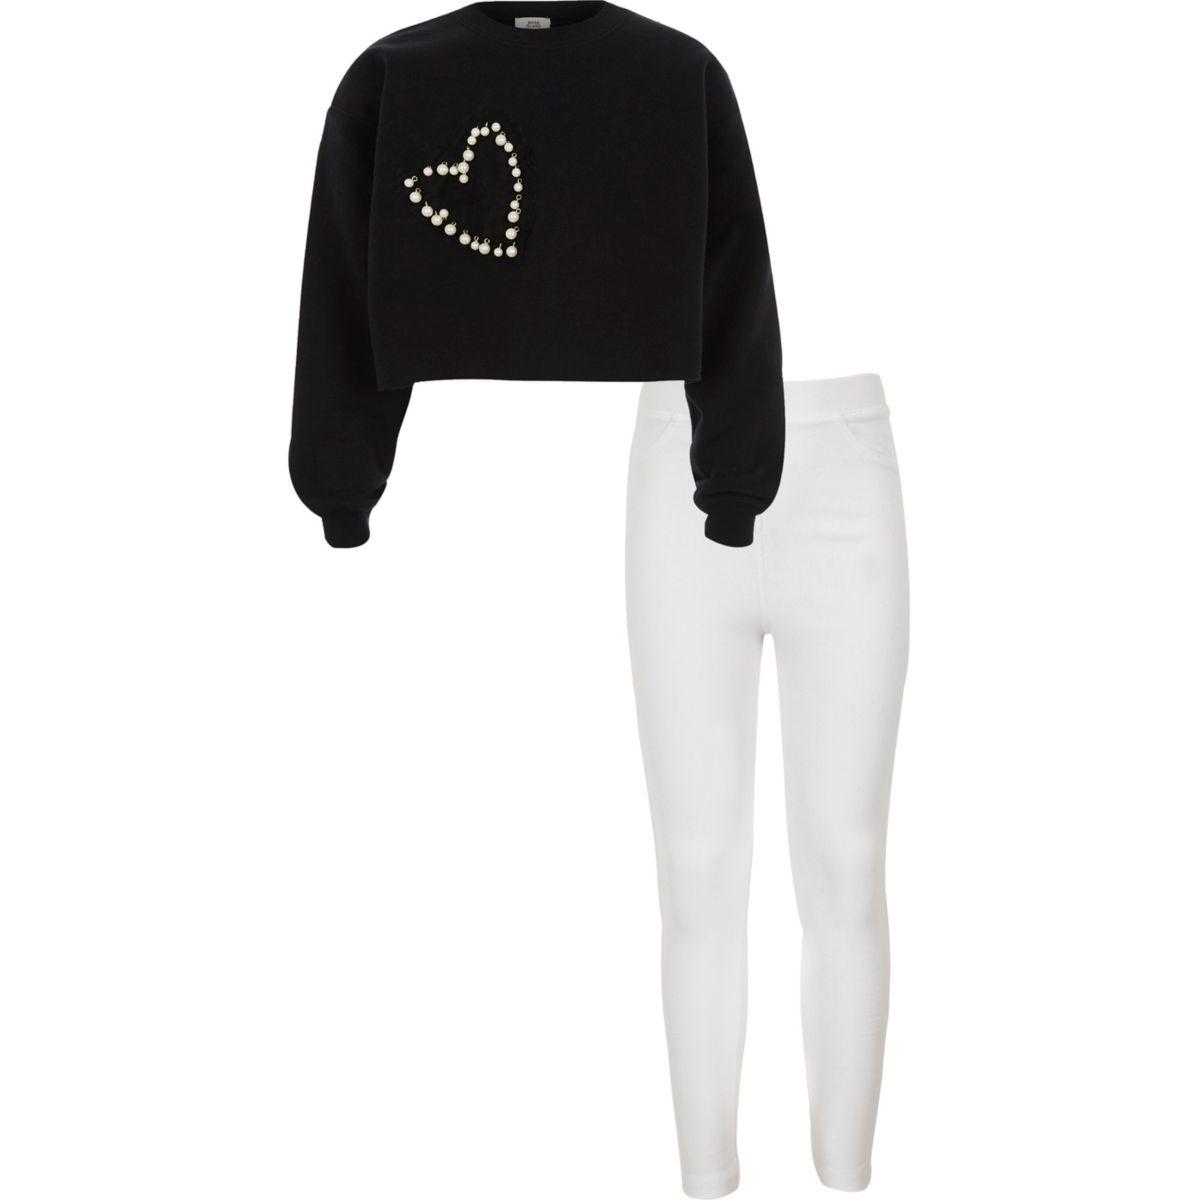 Girls black embellished crop sweatshirt oufit